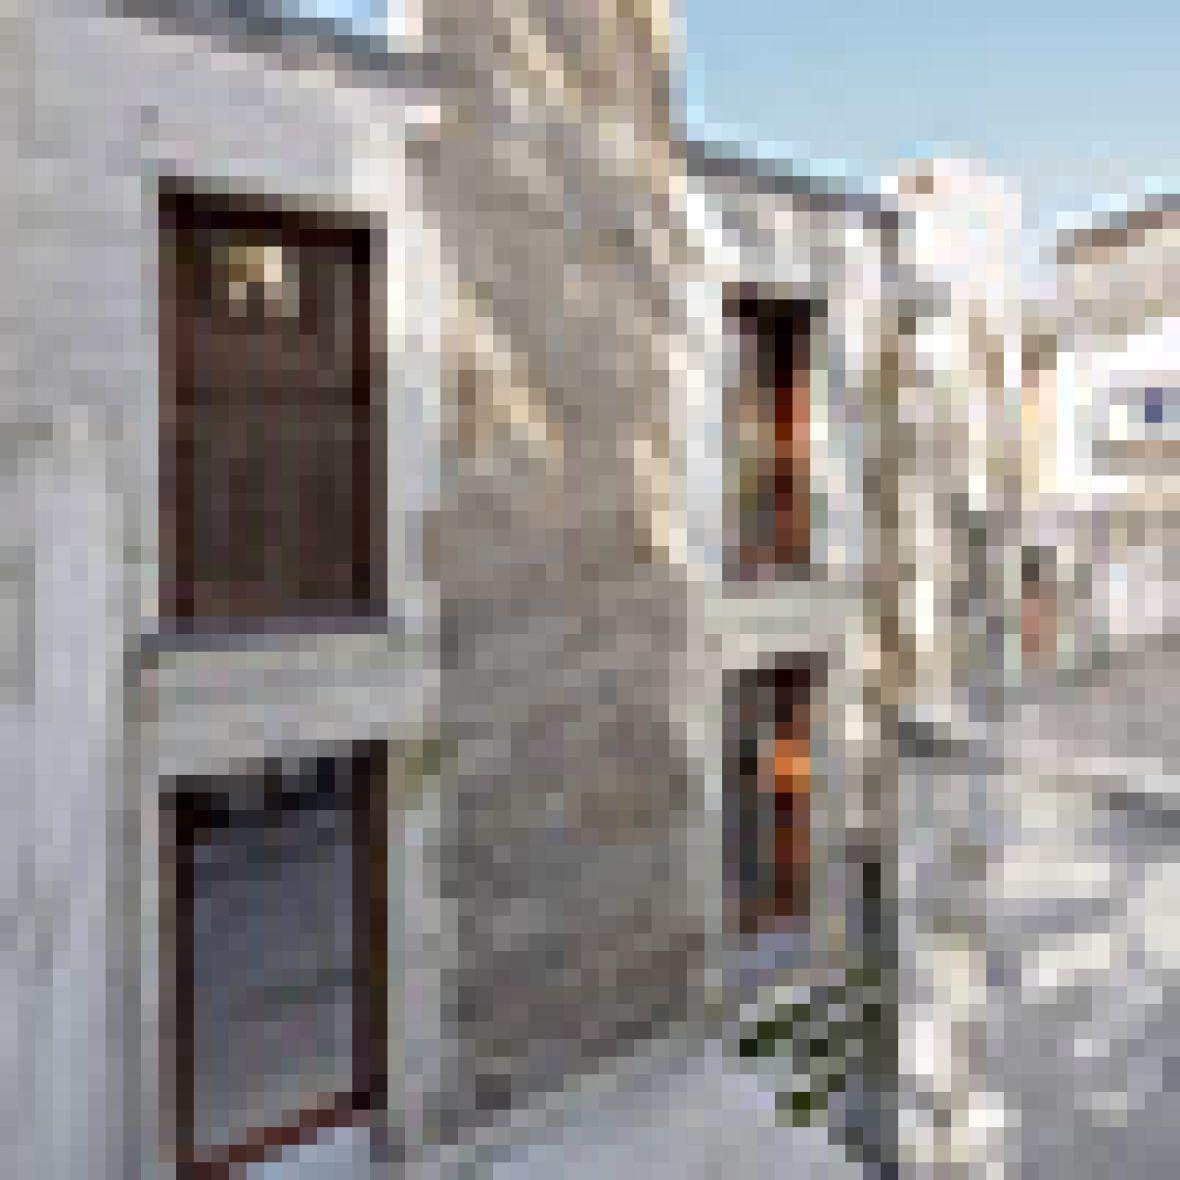 Reestructuracion viviendas rúa Fererria 45-47. Vigo